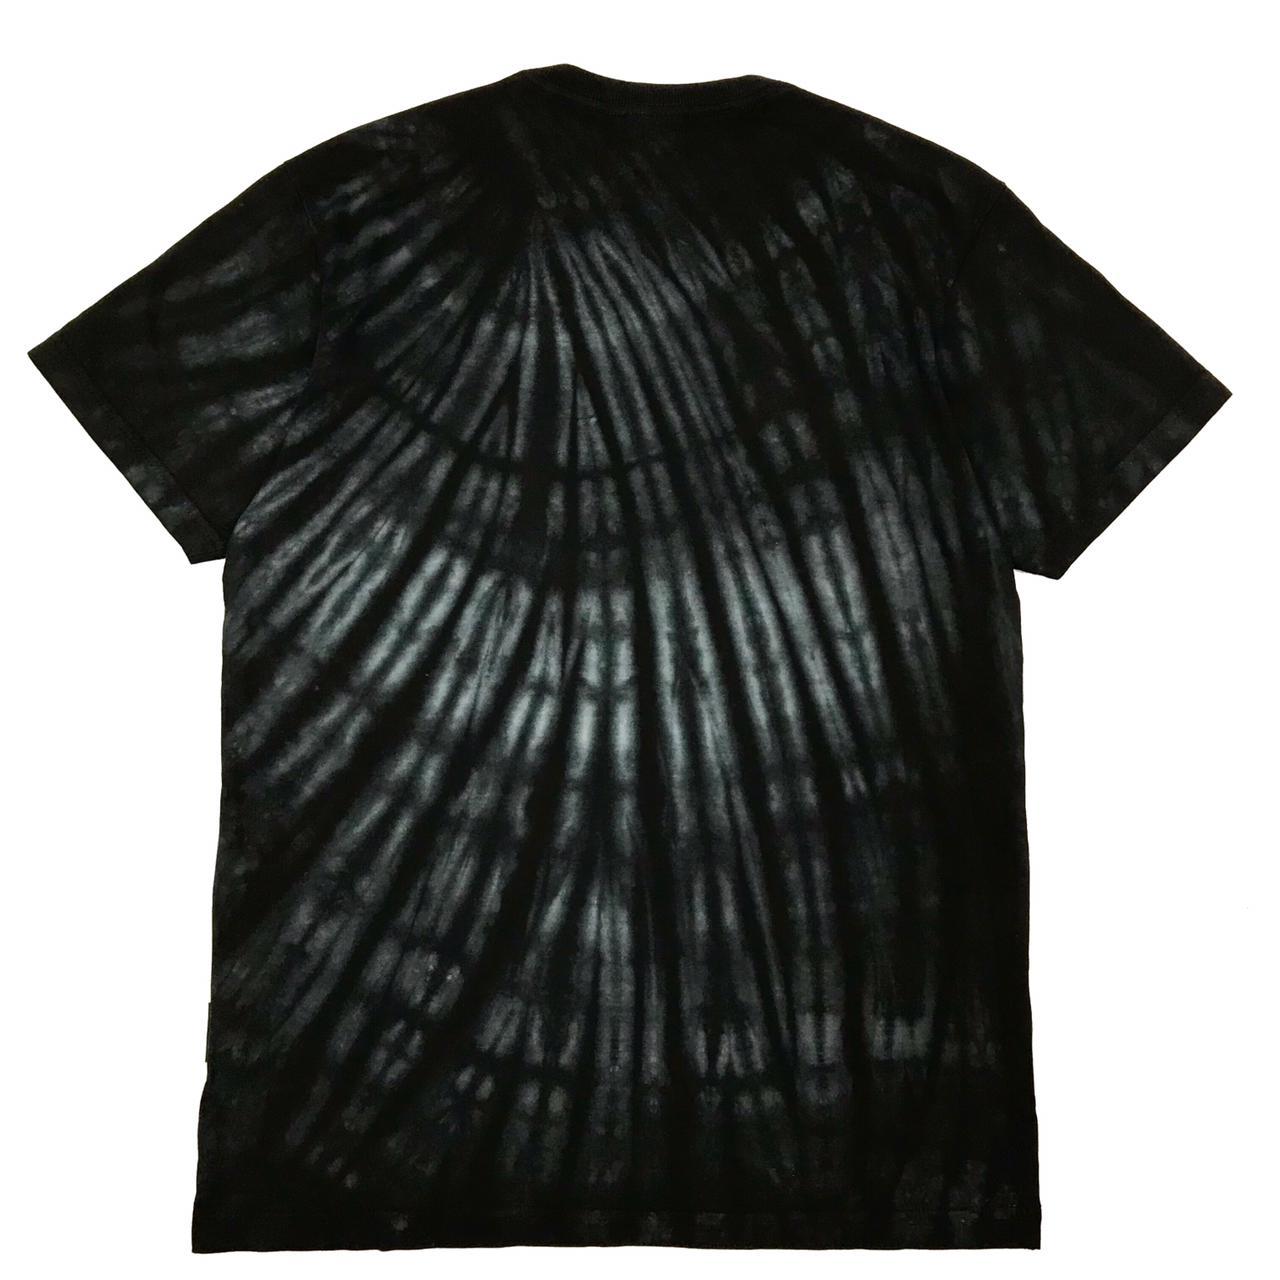 Camiseta Independent O.G.B.G. Tie Dye Black